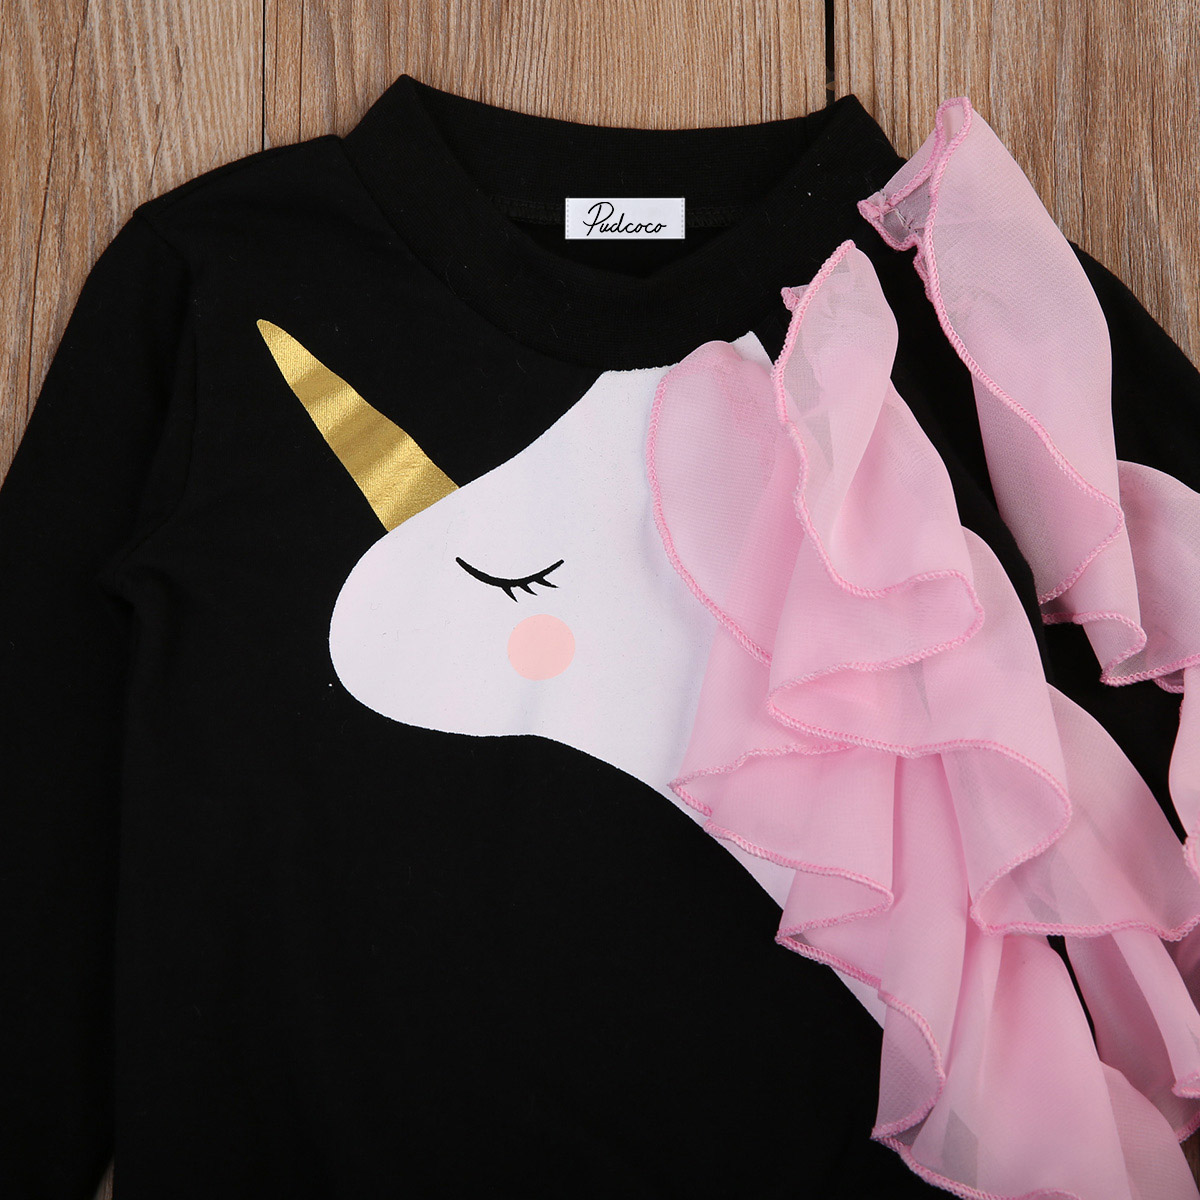 2020 Autumn Winter Kids Hoodies Baby Girls Unicorn Printed Sweatshirt Children Long Sleeve Cotton Tops Clothes 0-7 Years 4